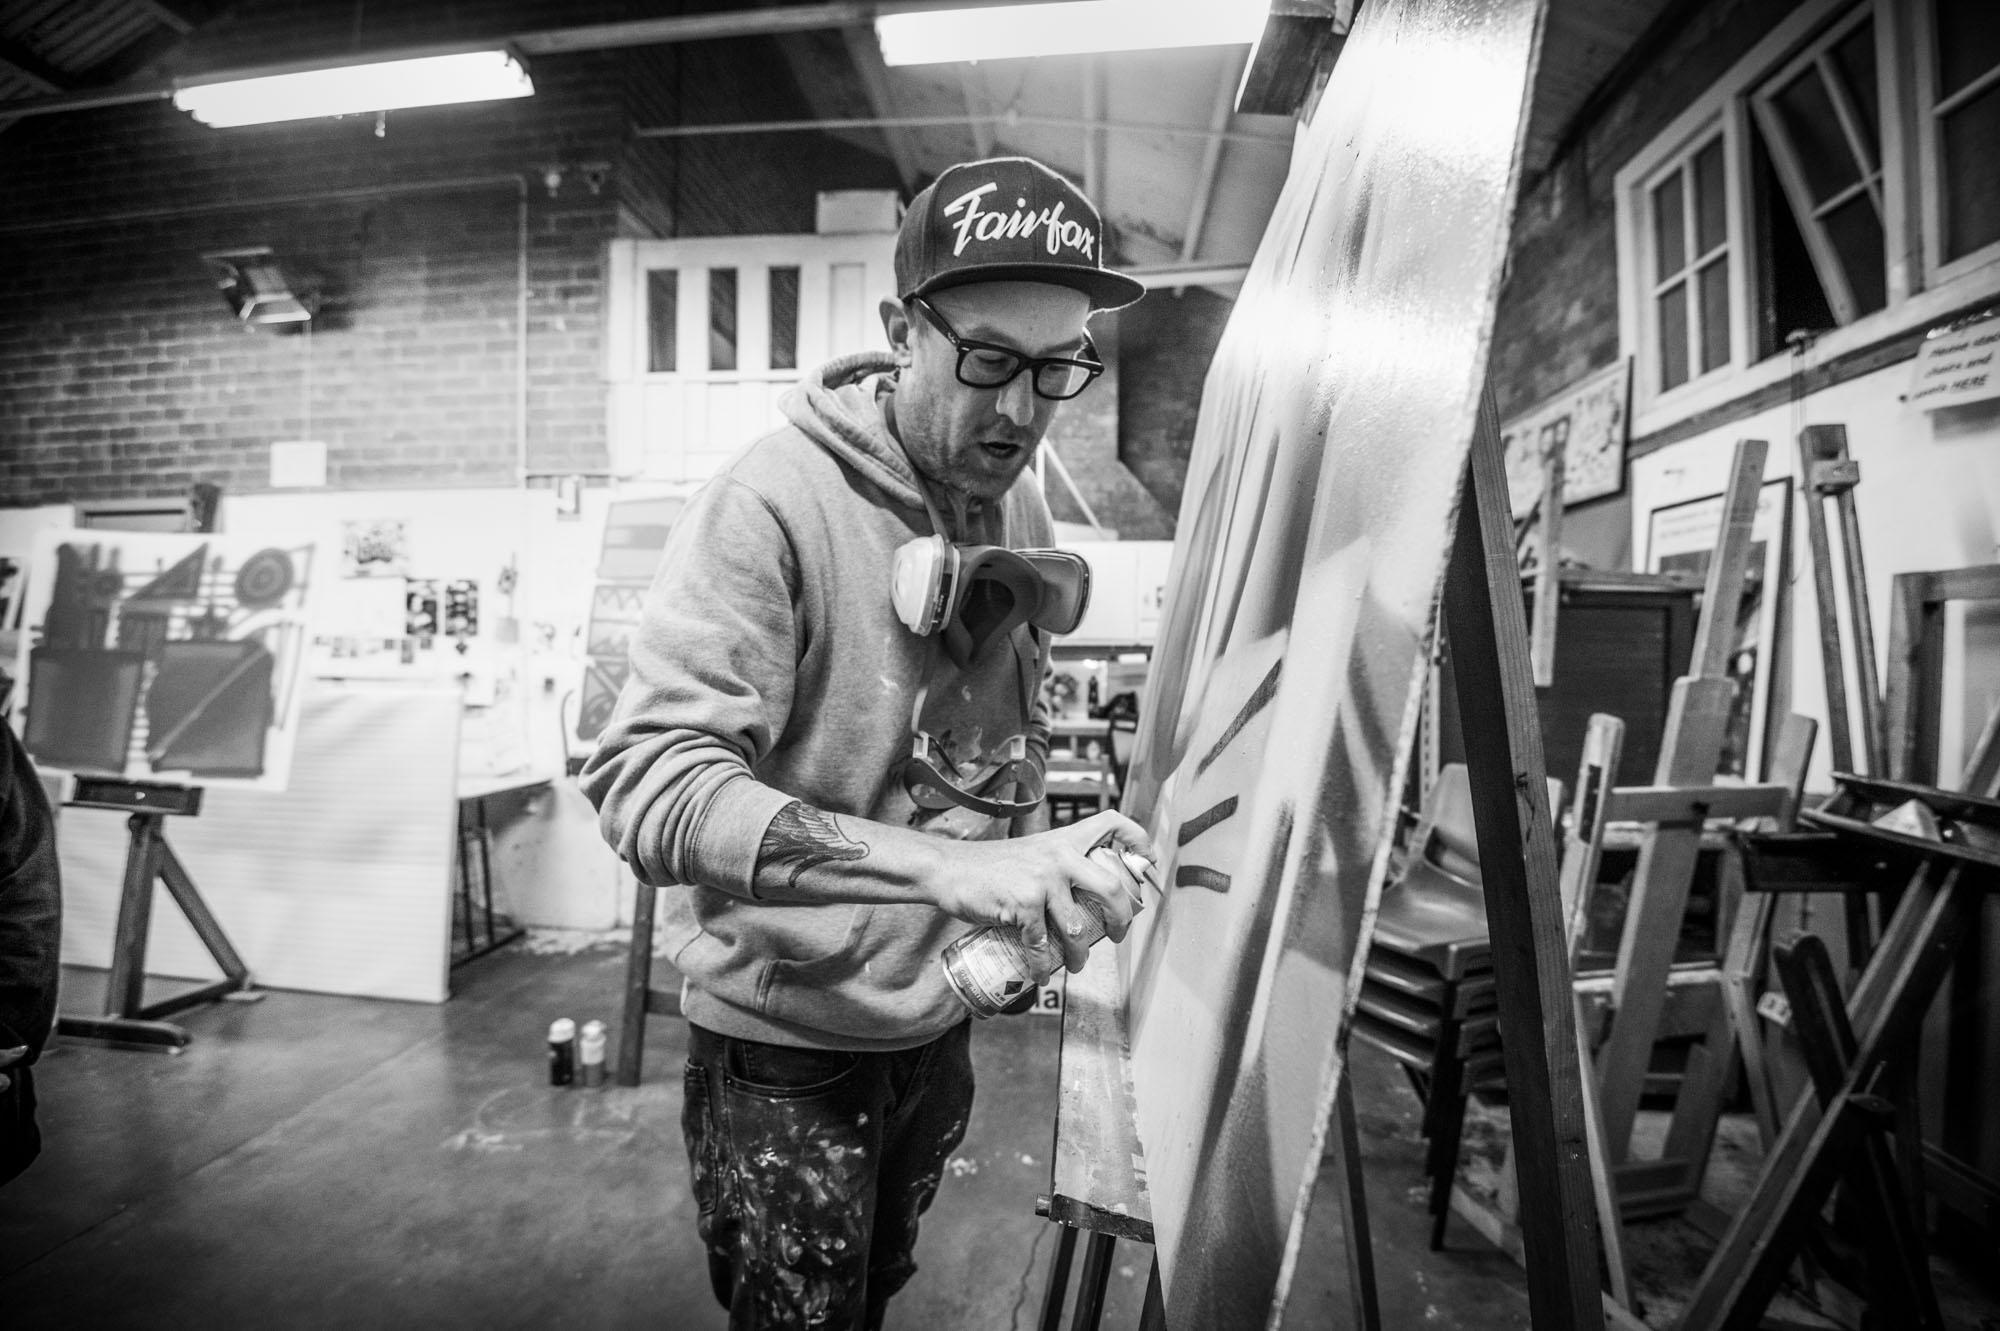 Graffiti Workshop demo